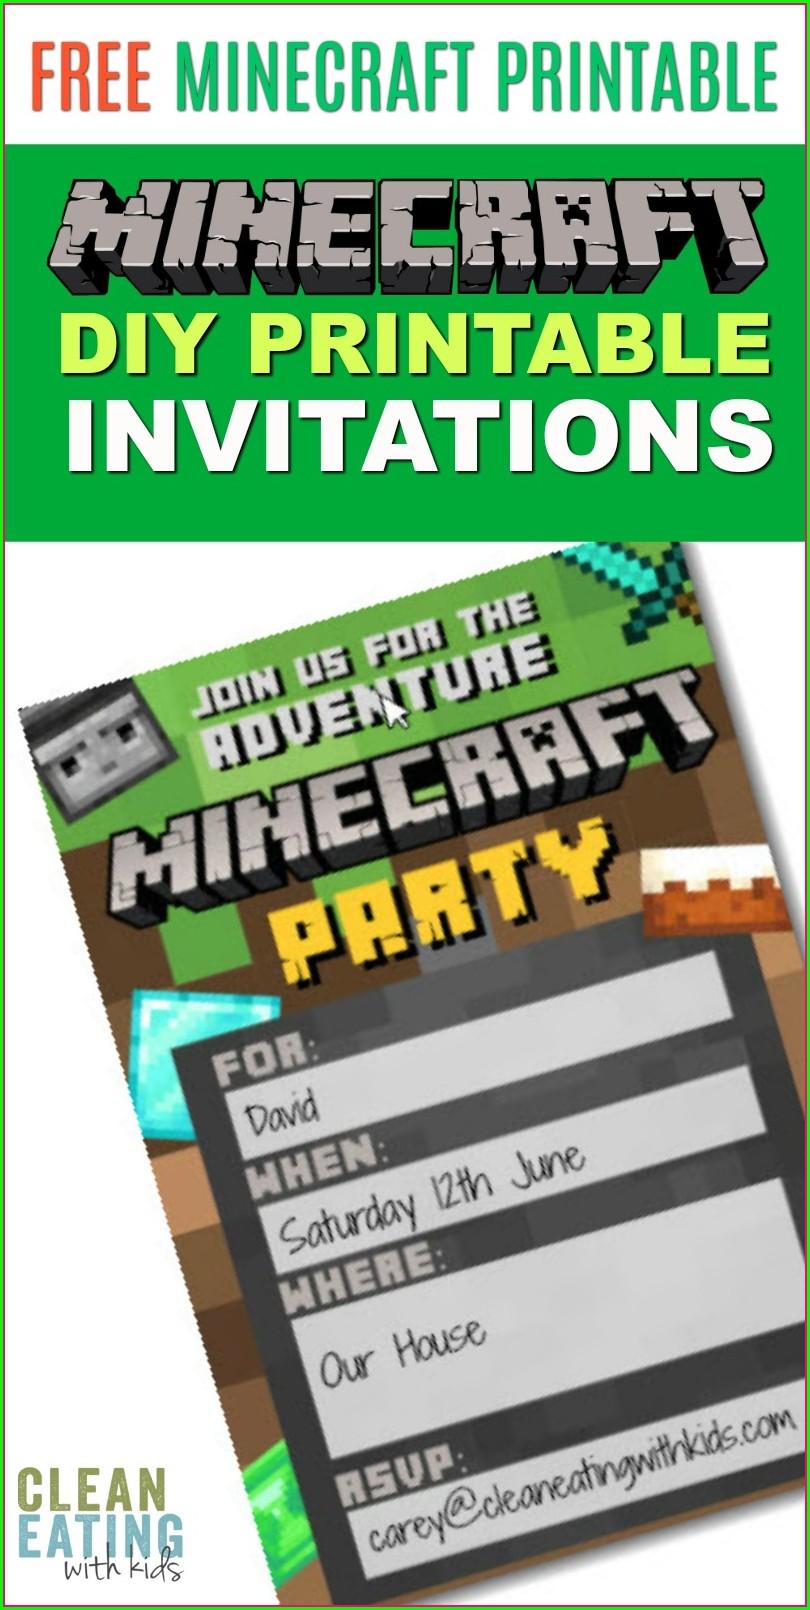 Downloadable Free Printable Minecraft Invitations